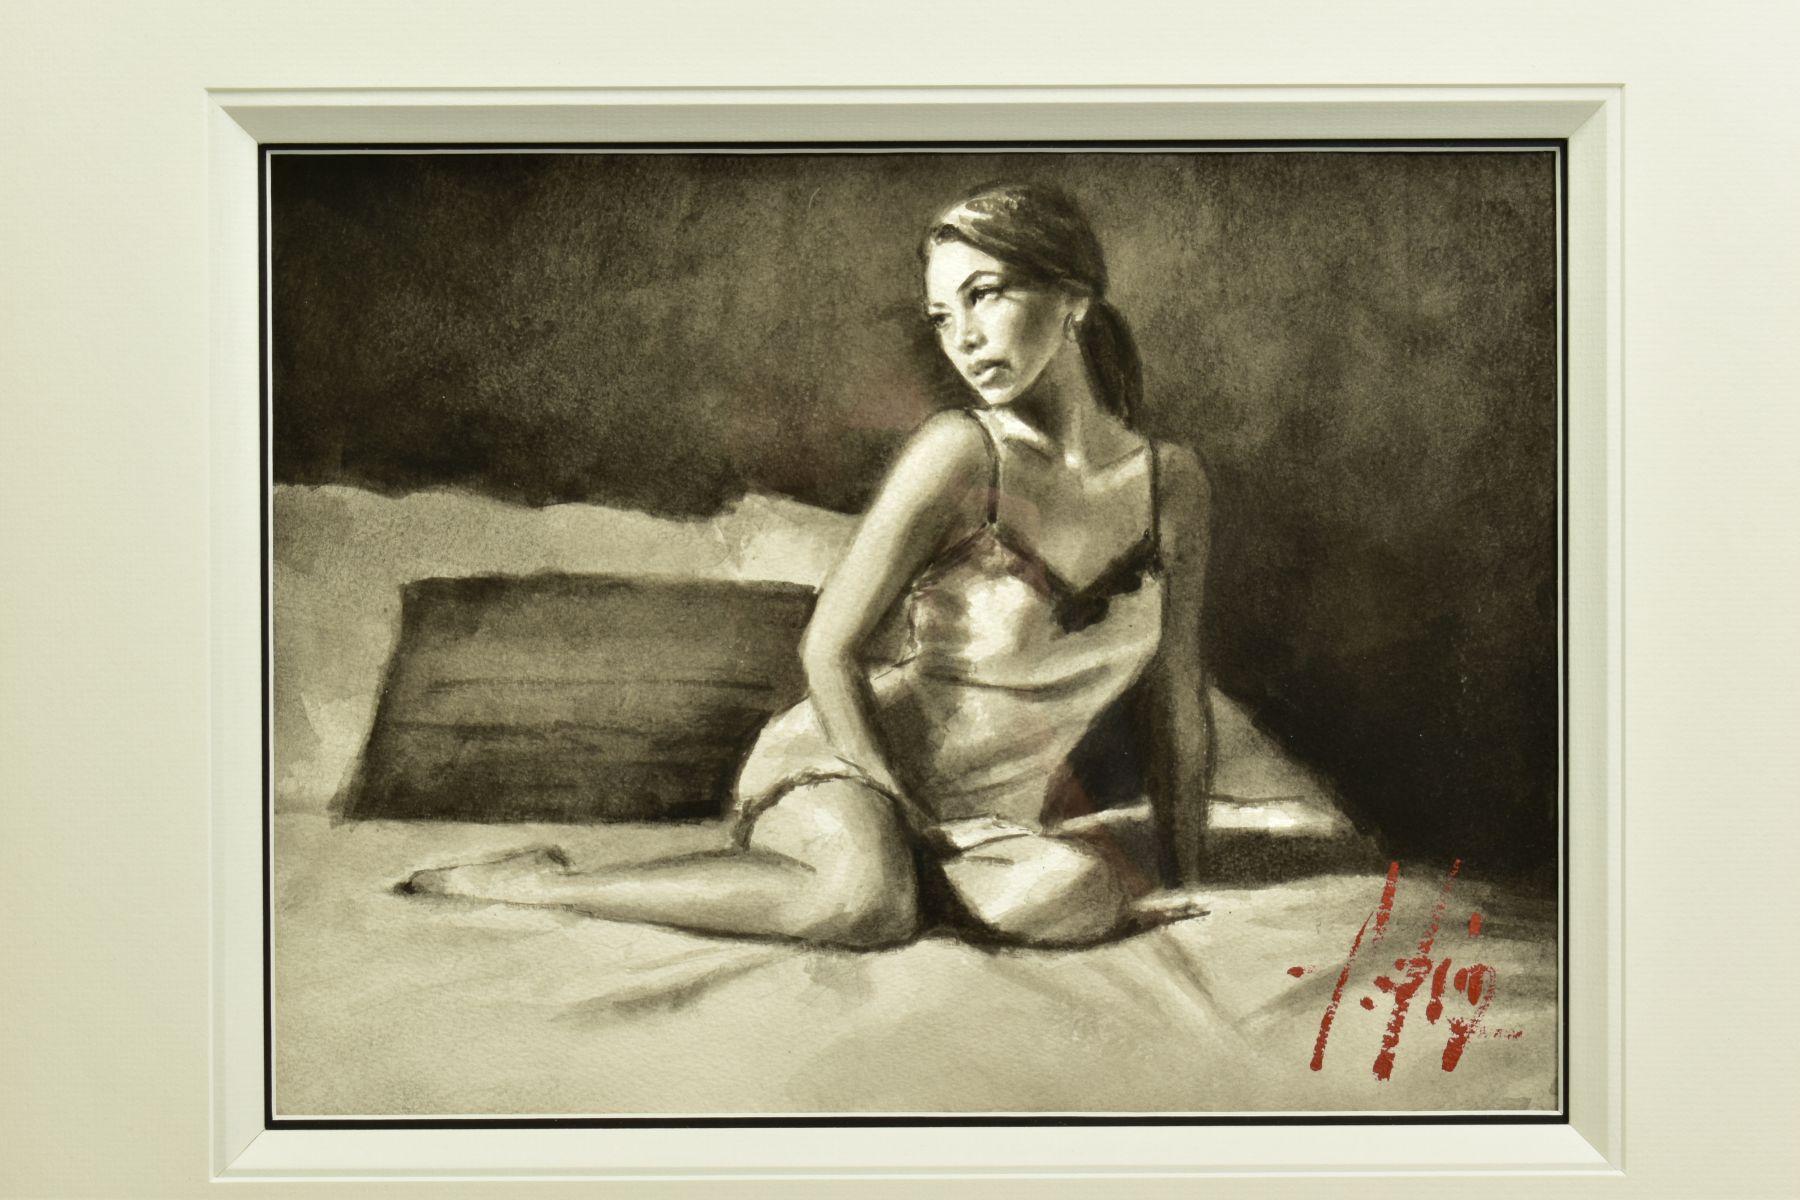 FABIAN PEREZ (ARGENTINA 1967), 'Andlucia VI', a portrait study of a scantily clad female figure, - Image 2 of 7